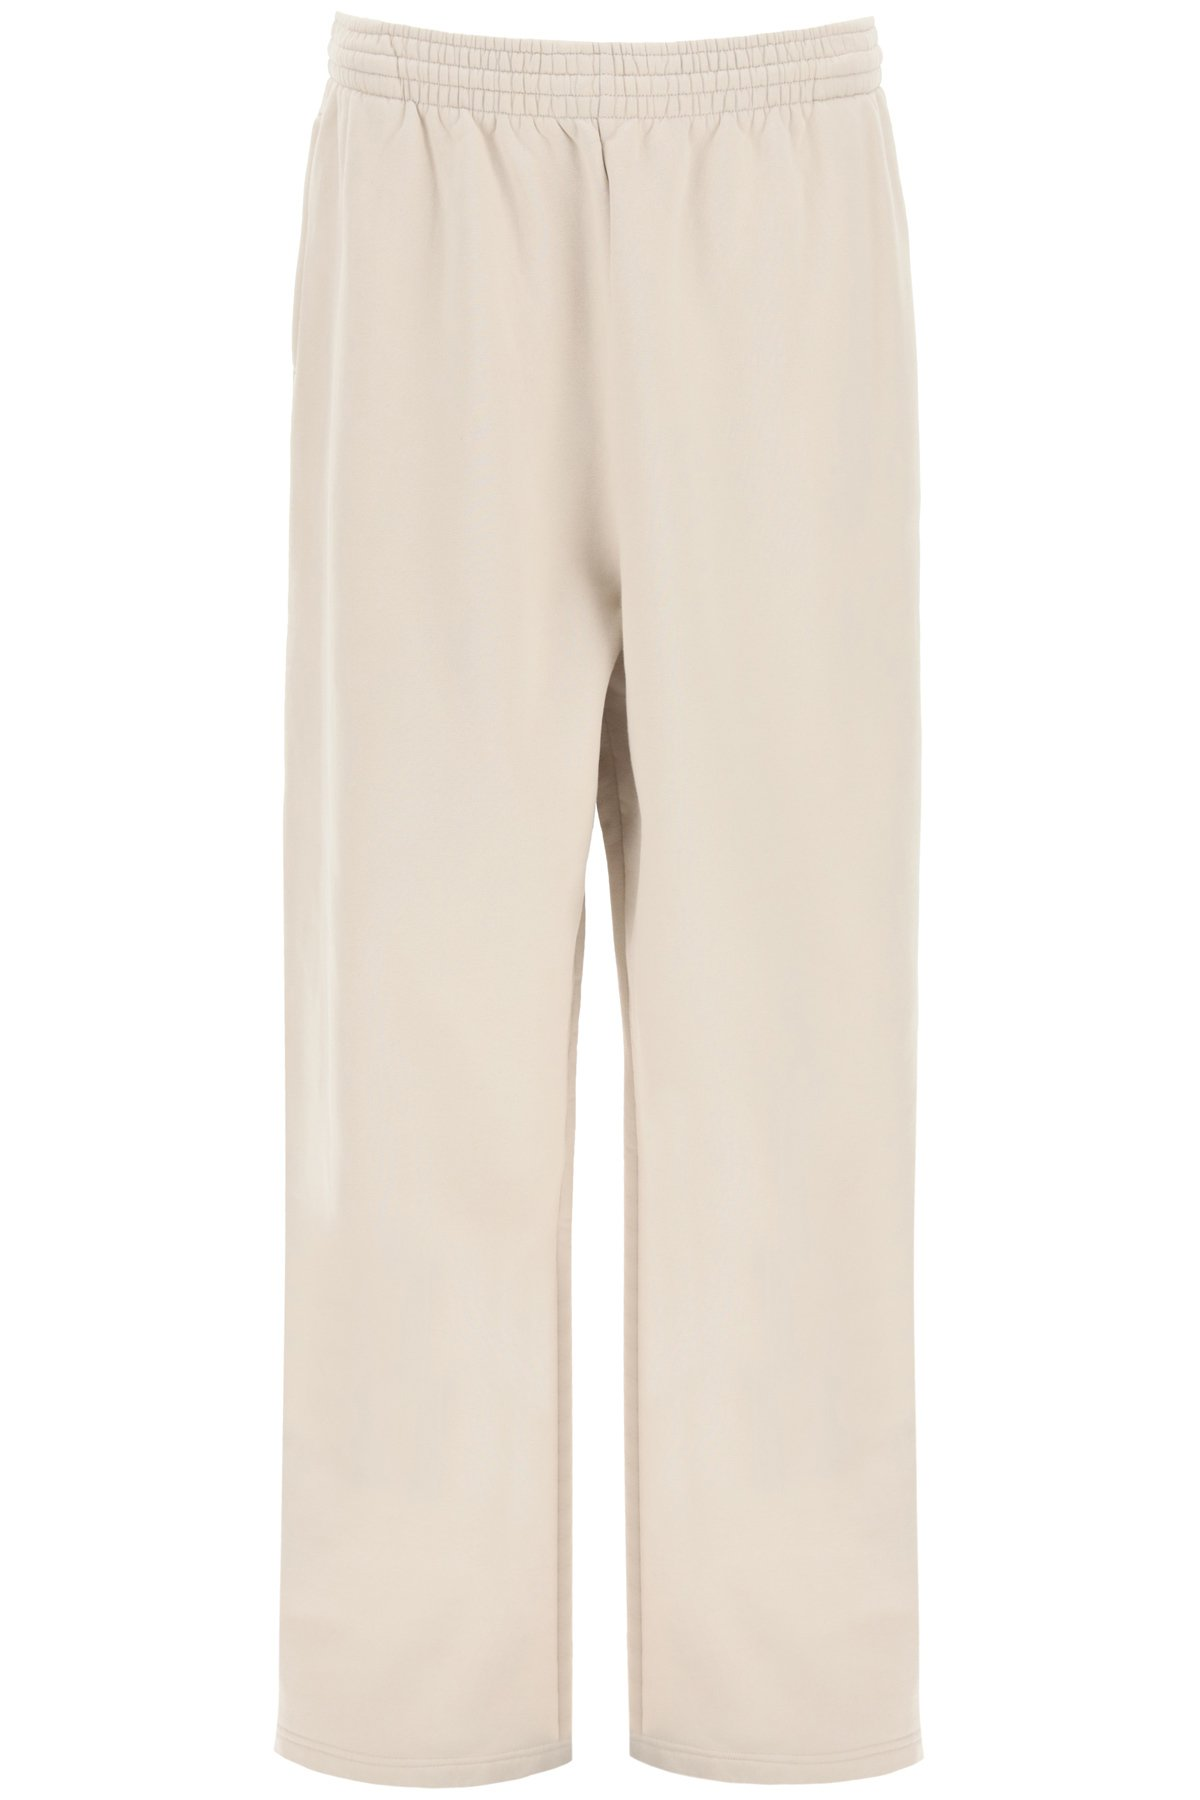 Balenciaga pantaloni jogger in felpa